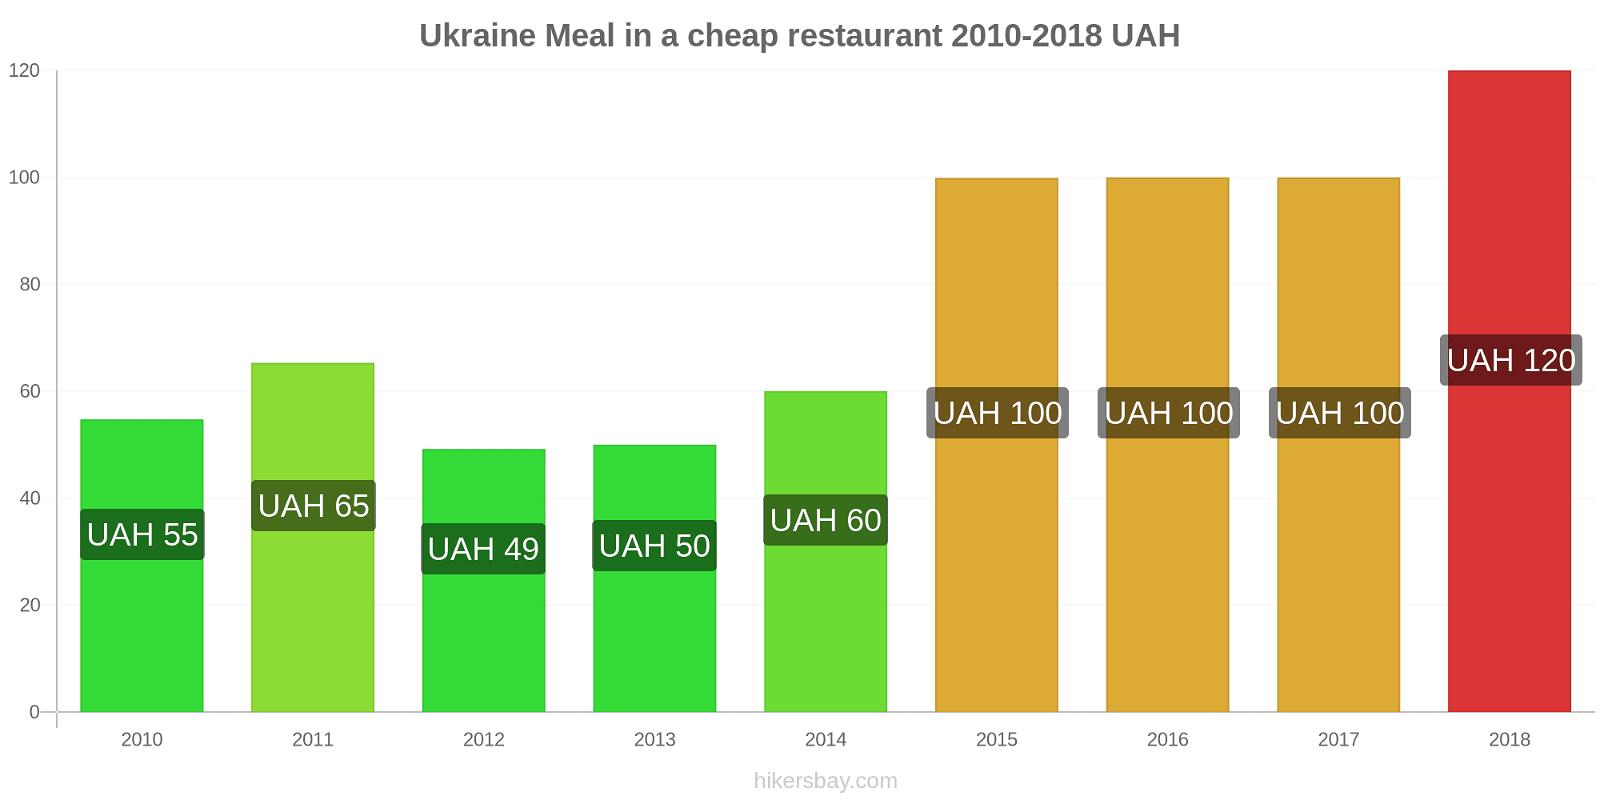 Ukraine price changes Meal in a cheap restaurant hikersbay.com